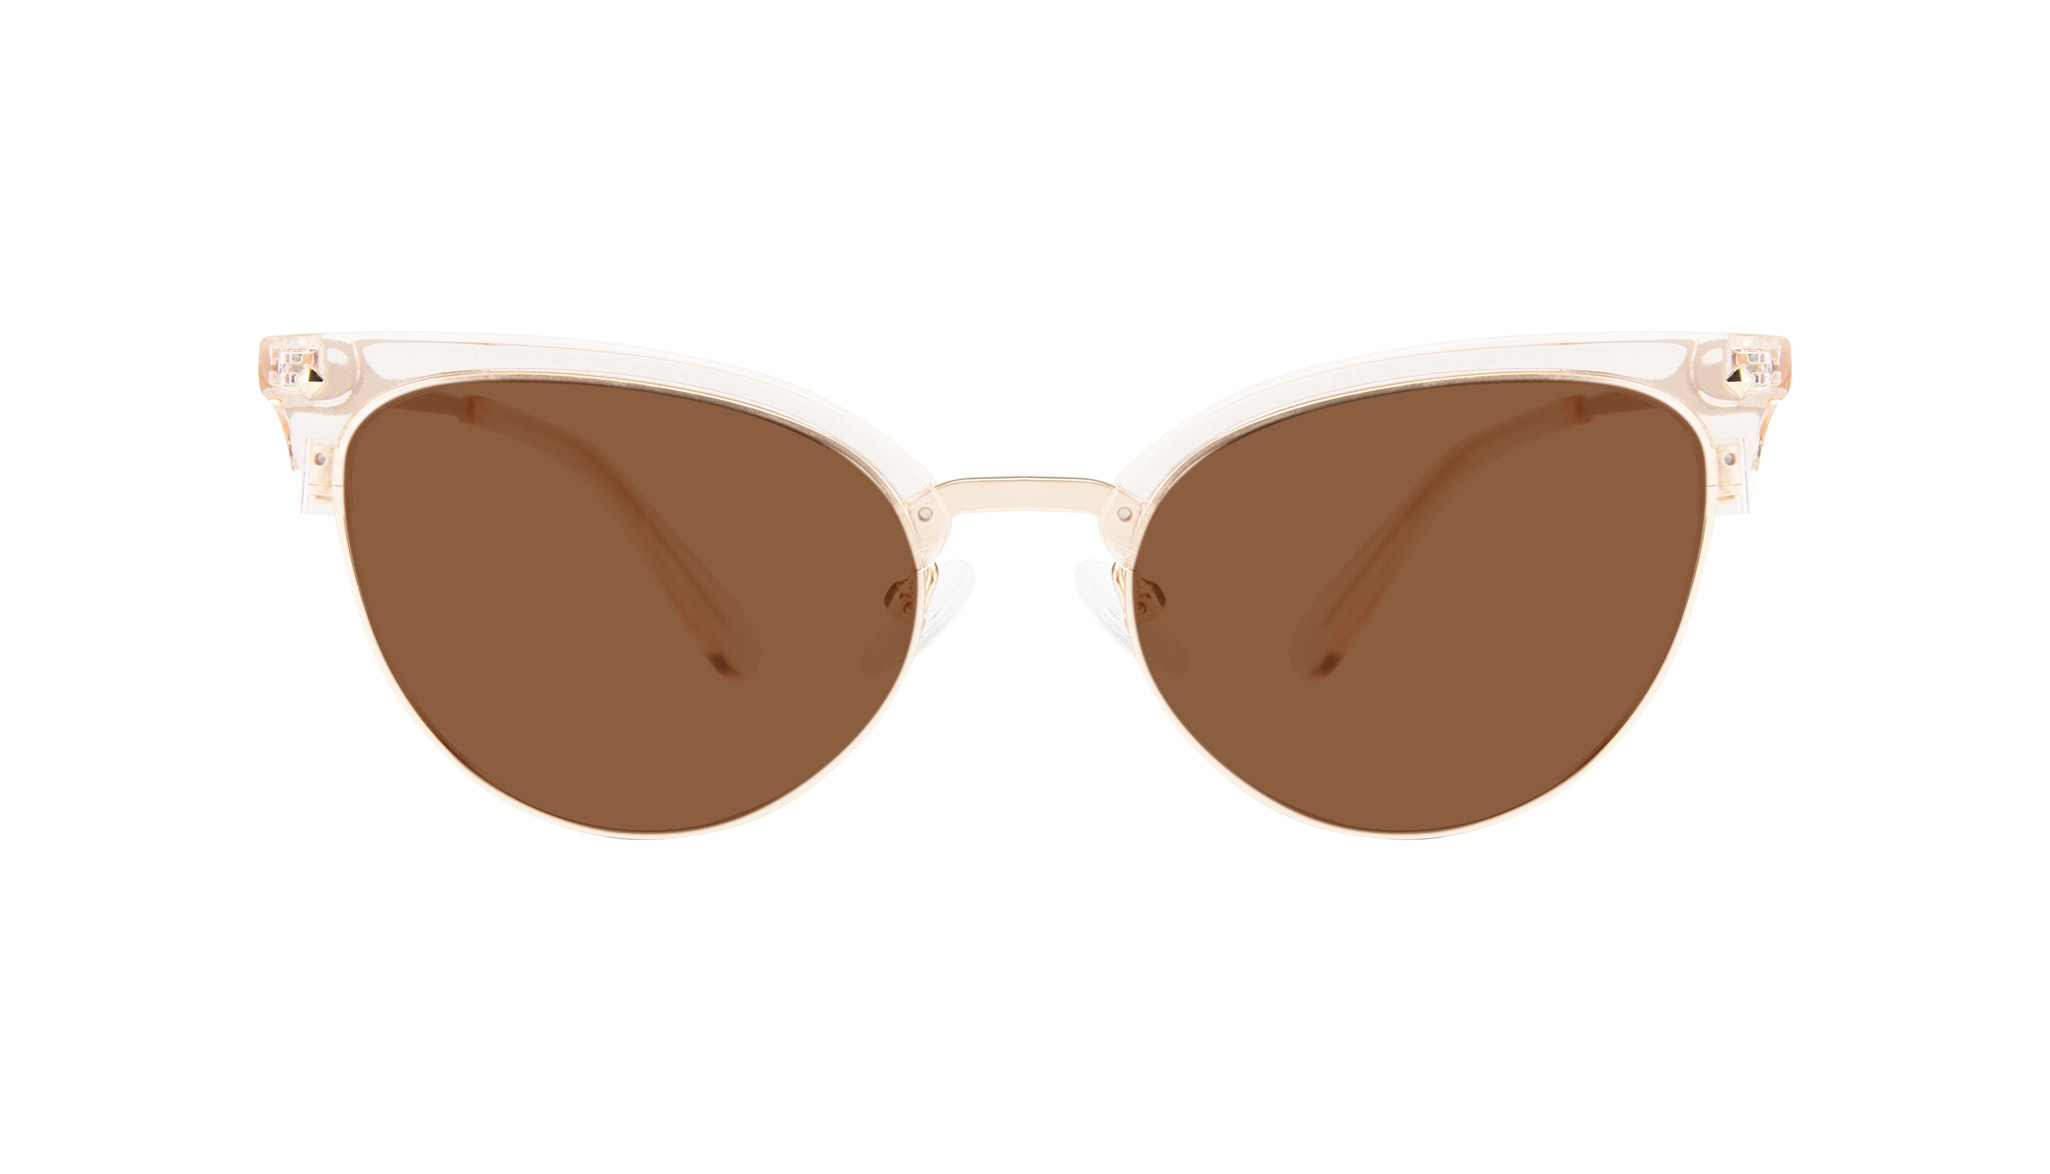 Affordable Fashion Glasses Cat Eye Daring Cateye Sunglasses Women Moon Blond Front